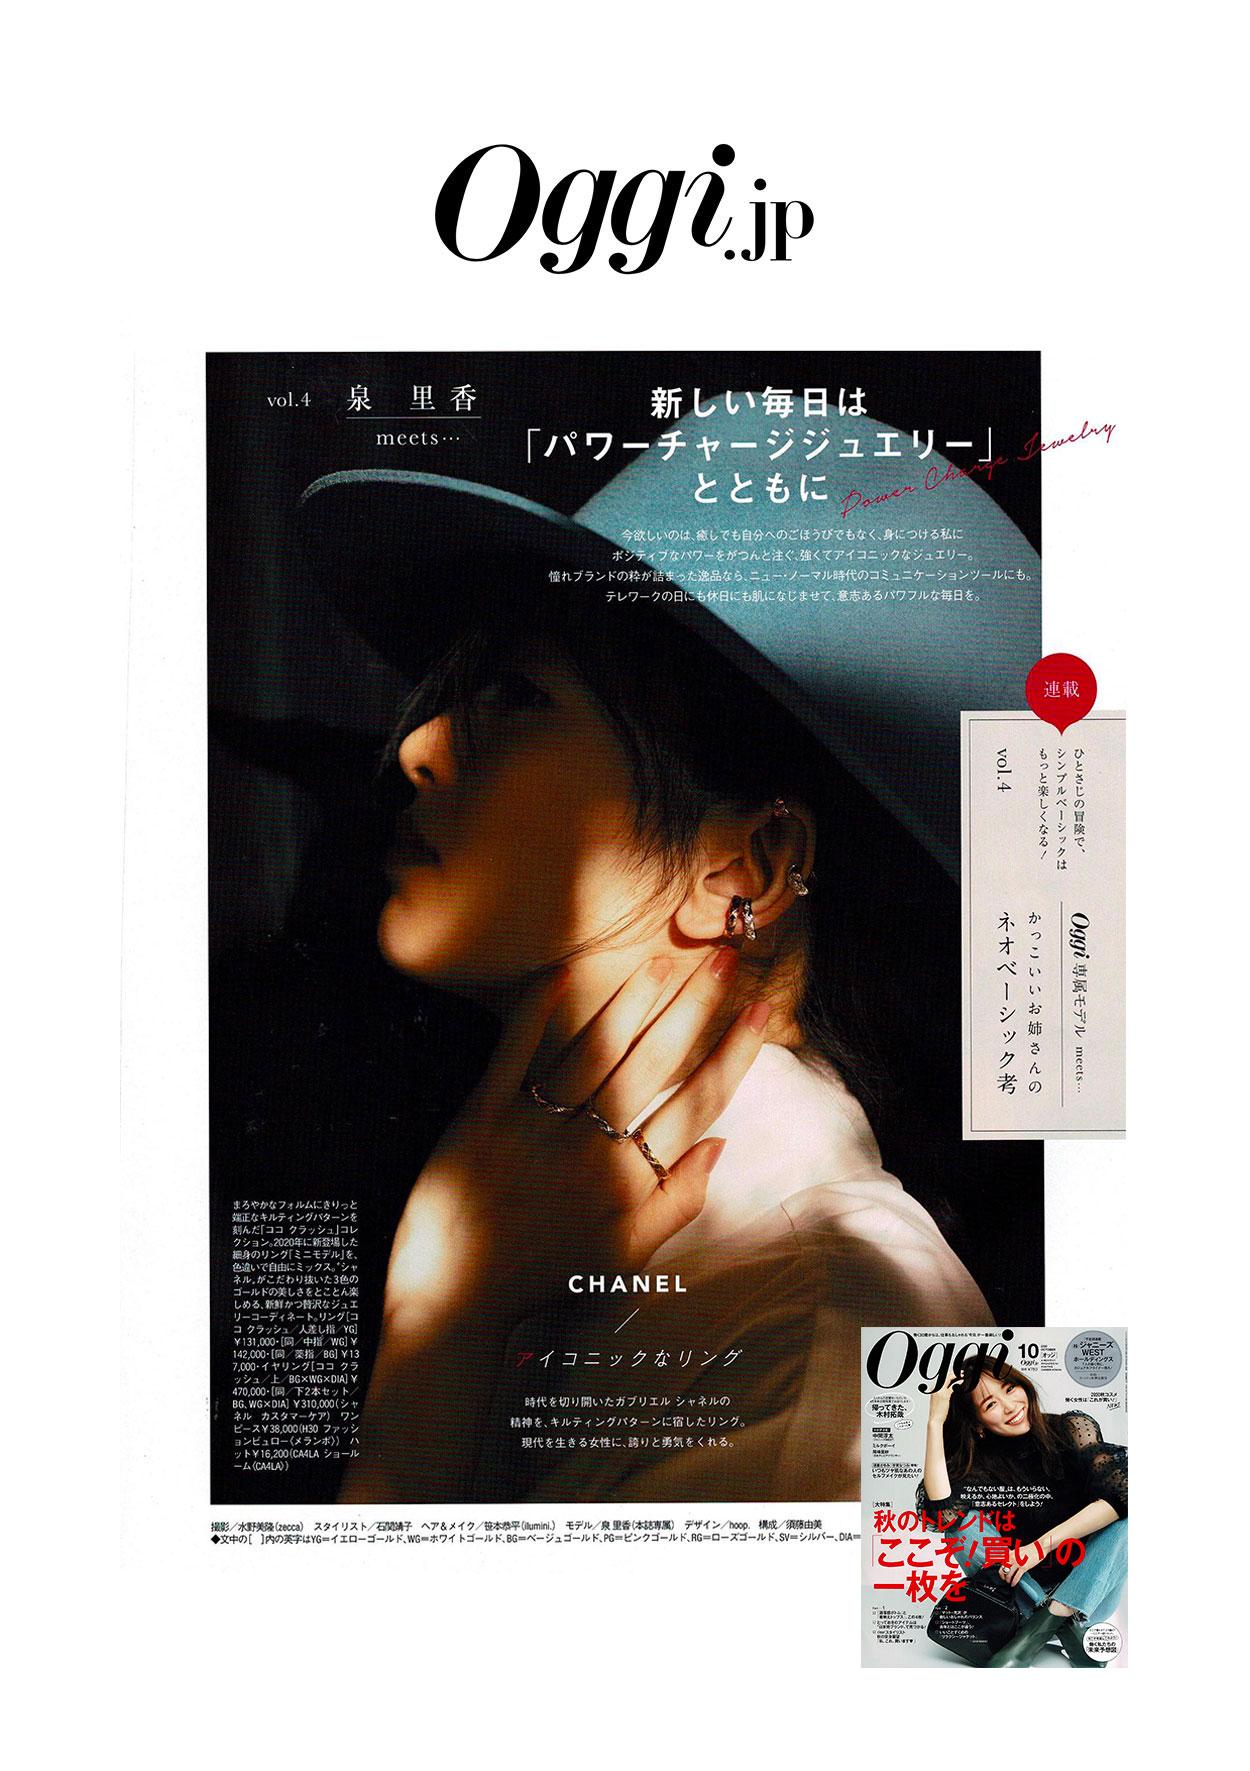 melampo-press-oggi-japan-magazine